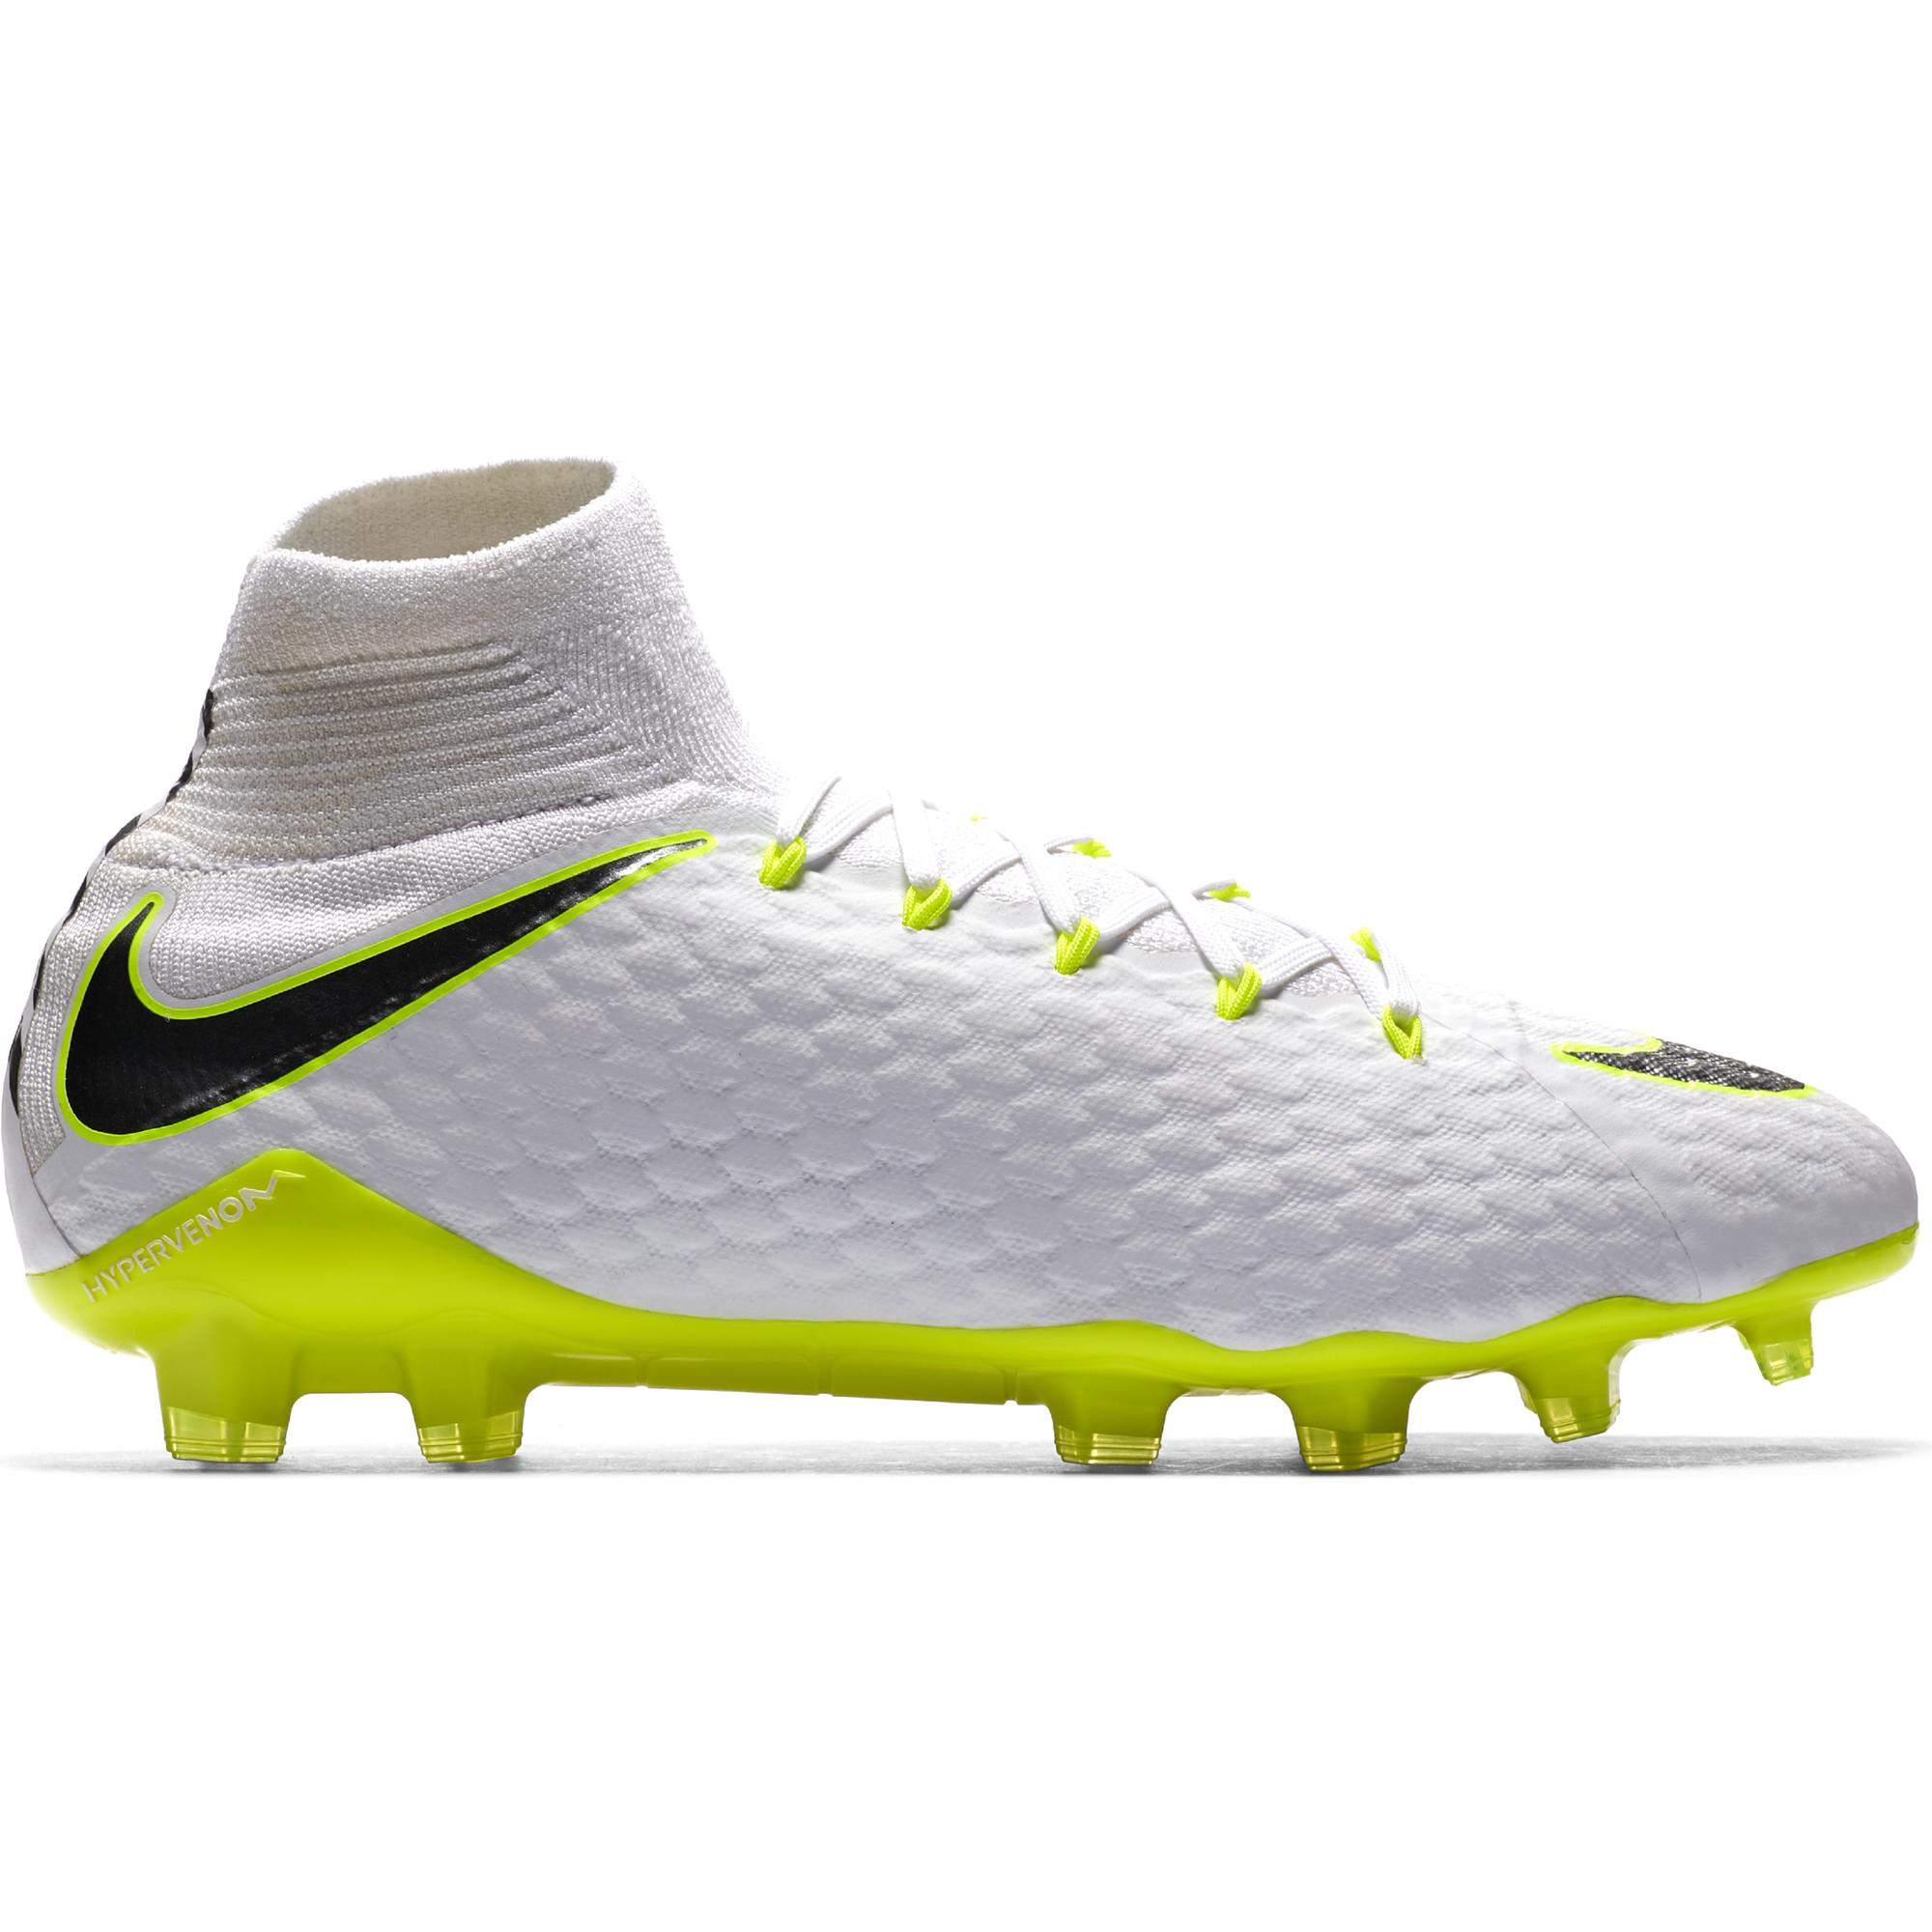 Nike Scarpe Calcio Phantom 3 Pro Dynamic Fit Fg